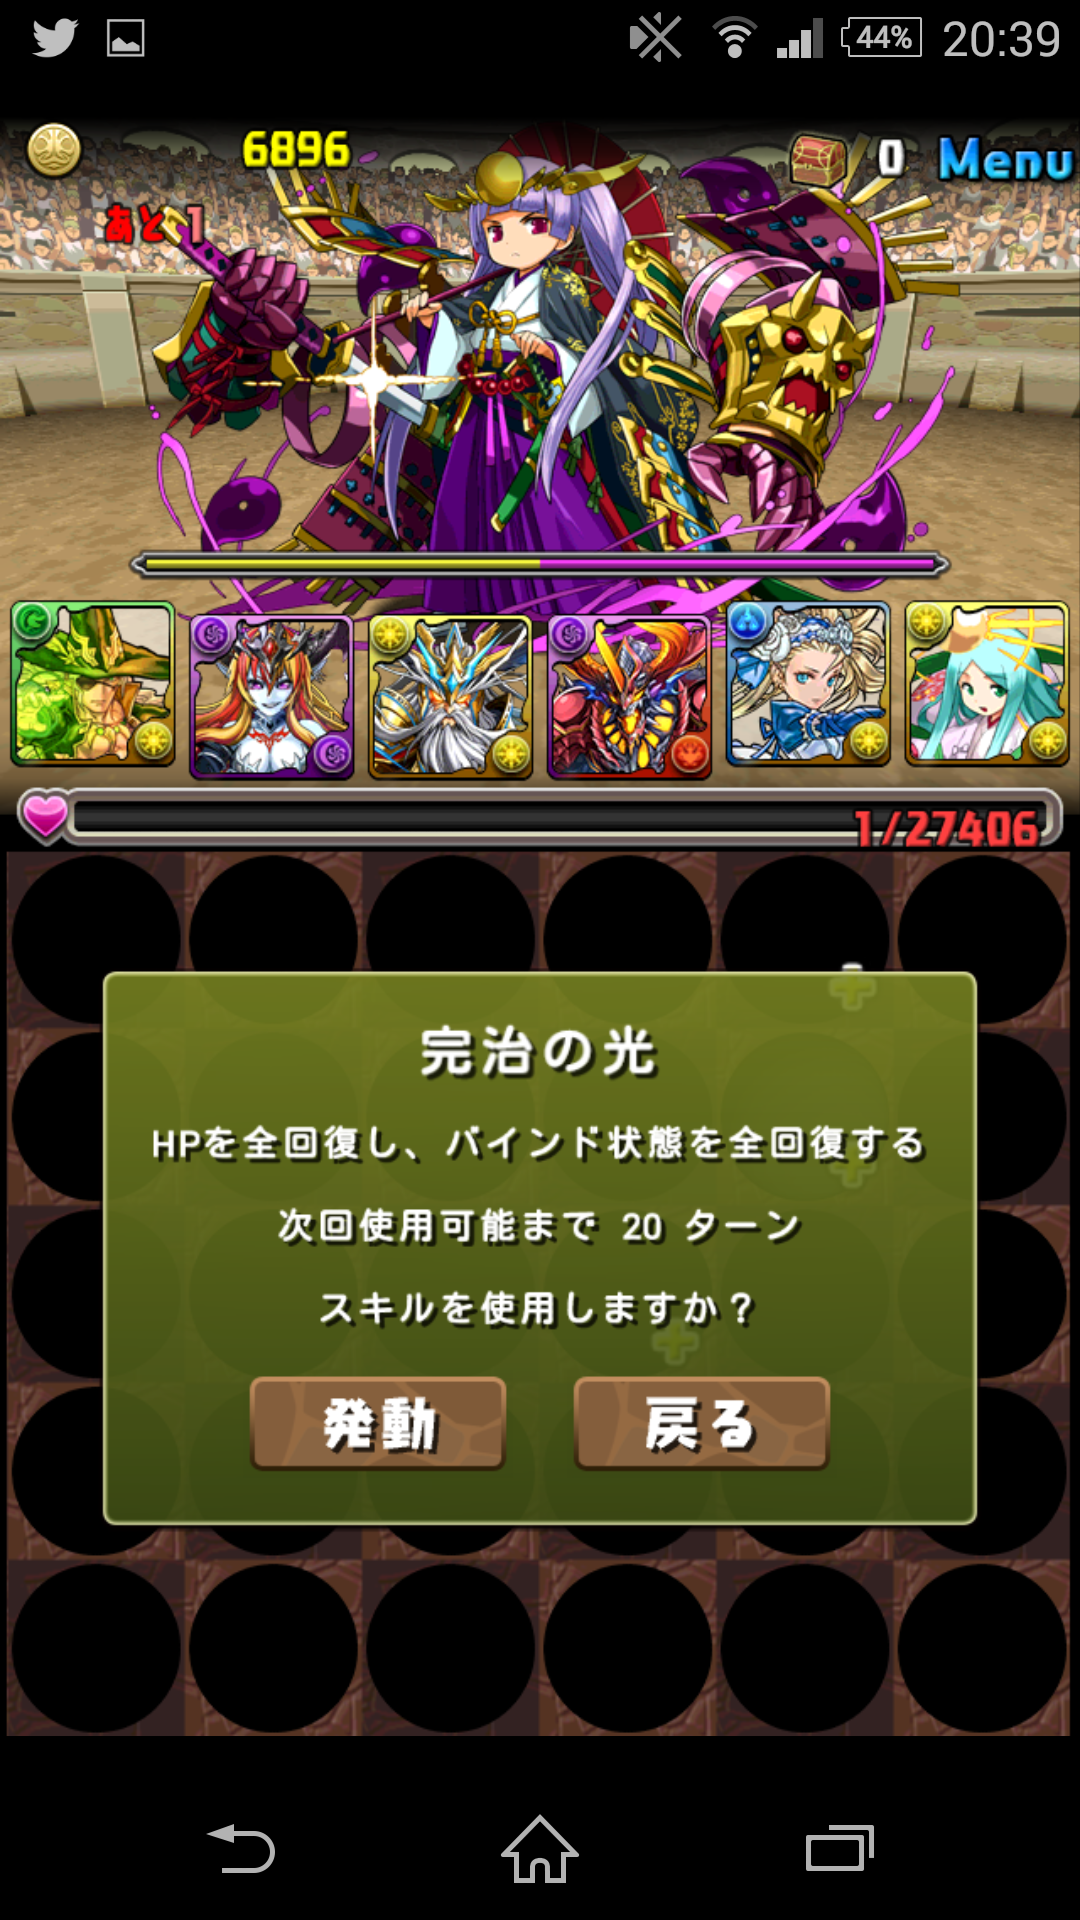 Screenshot_2015-01-29-20-39-58.png